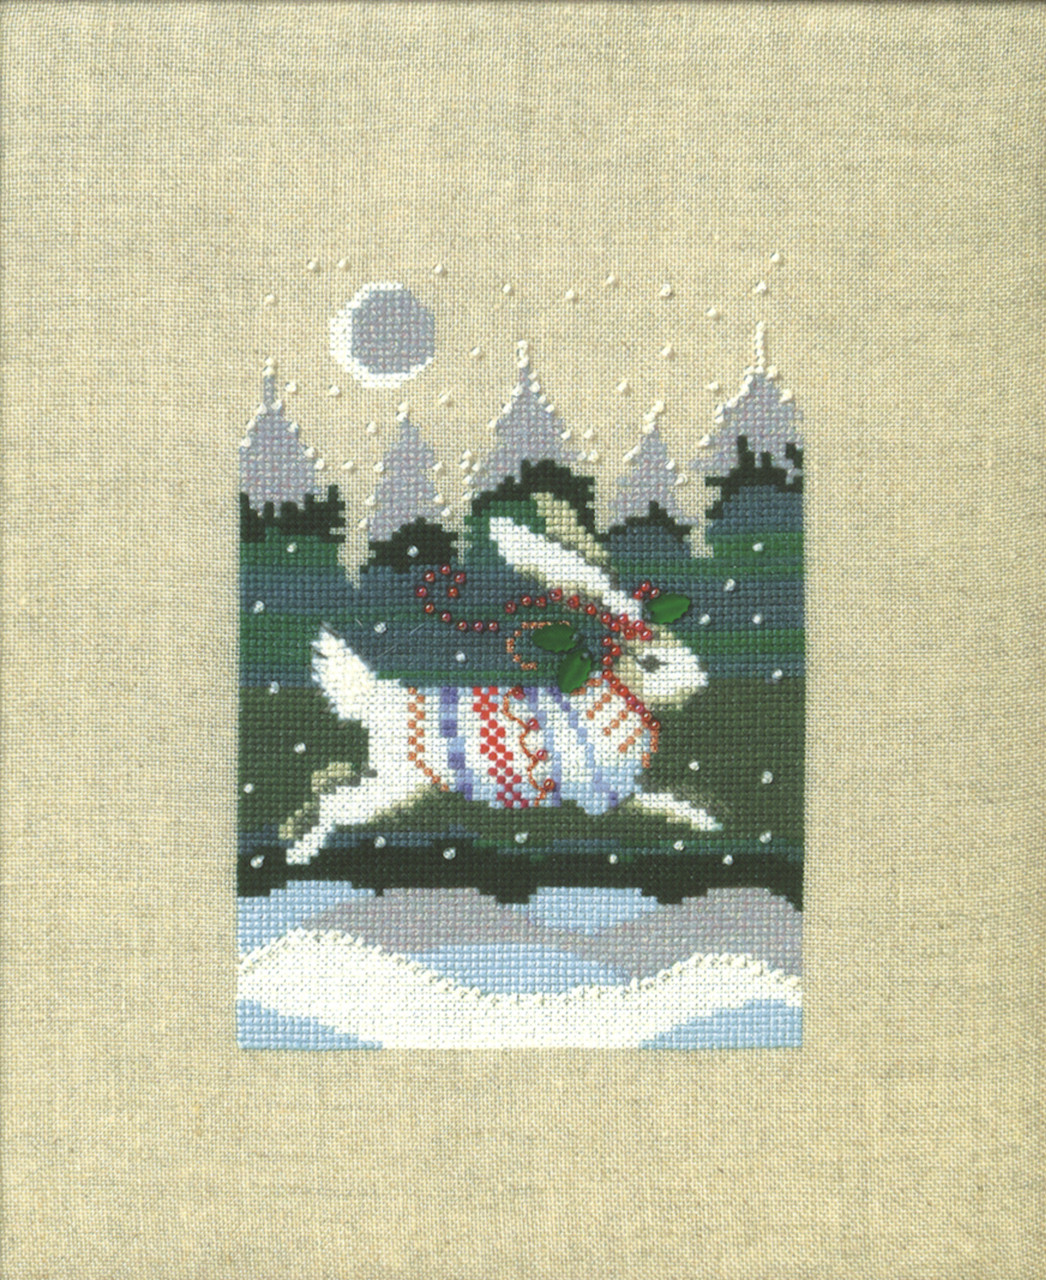 Nora Corbett - Winter Hare